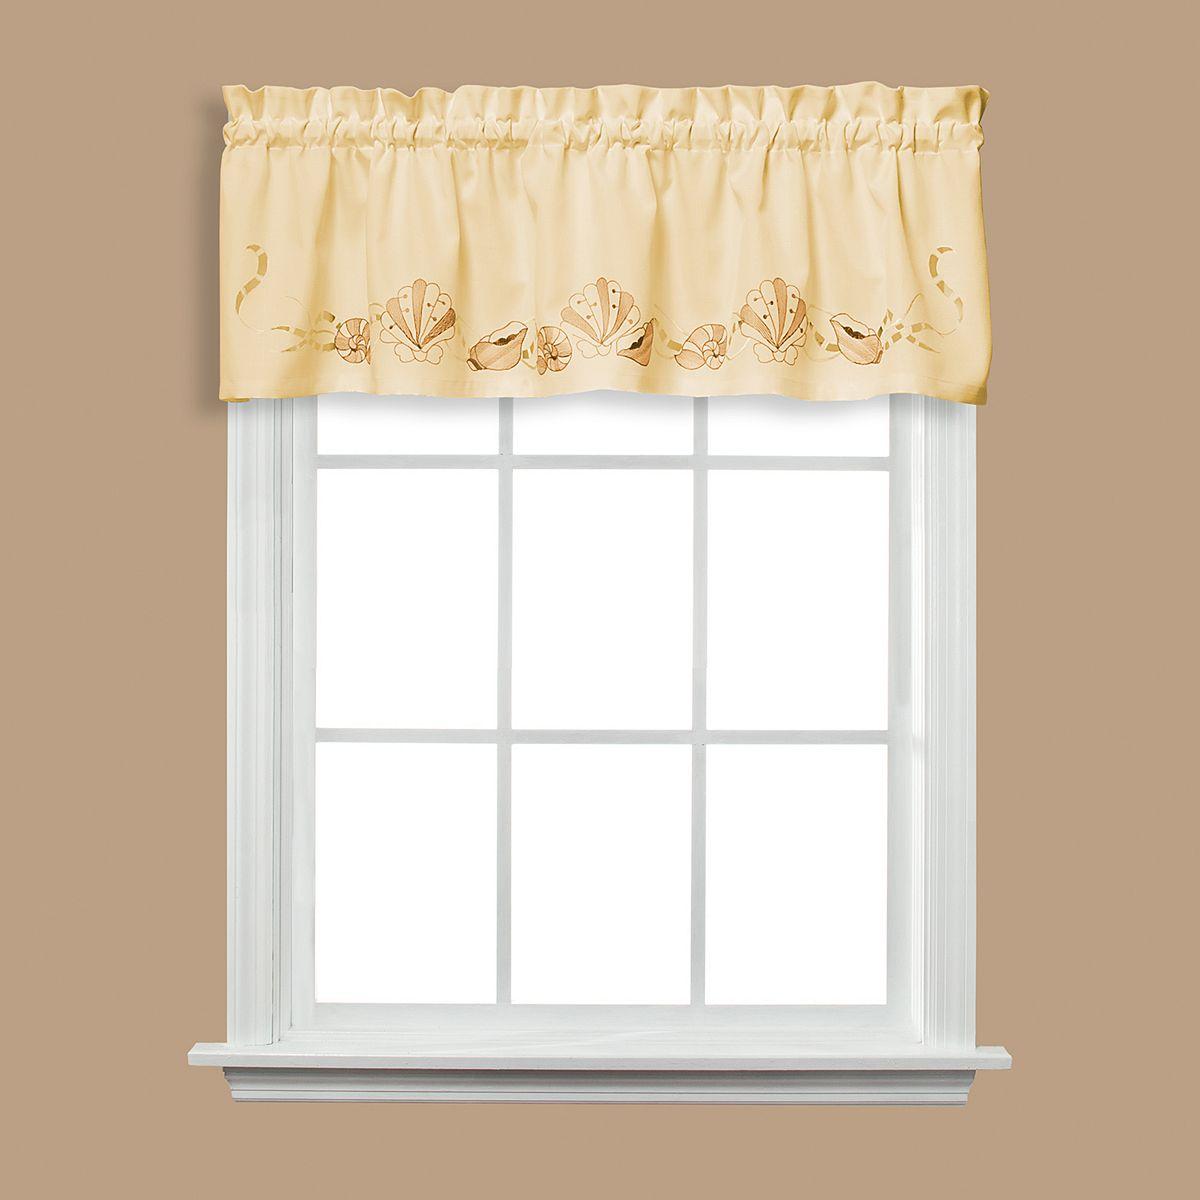 Seabreeze Swag Tier Kitchen Window Curtains L6V35